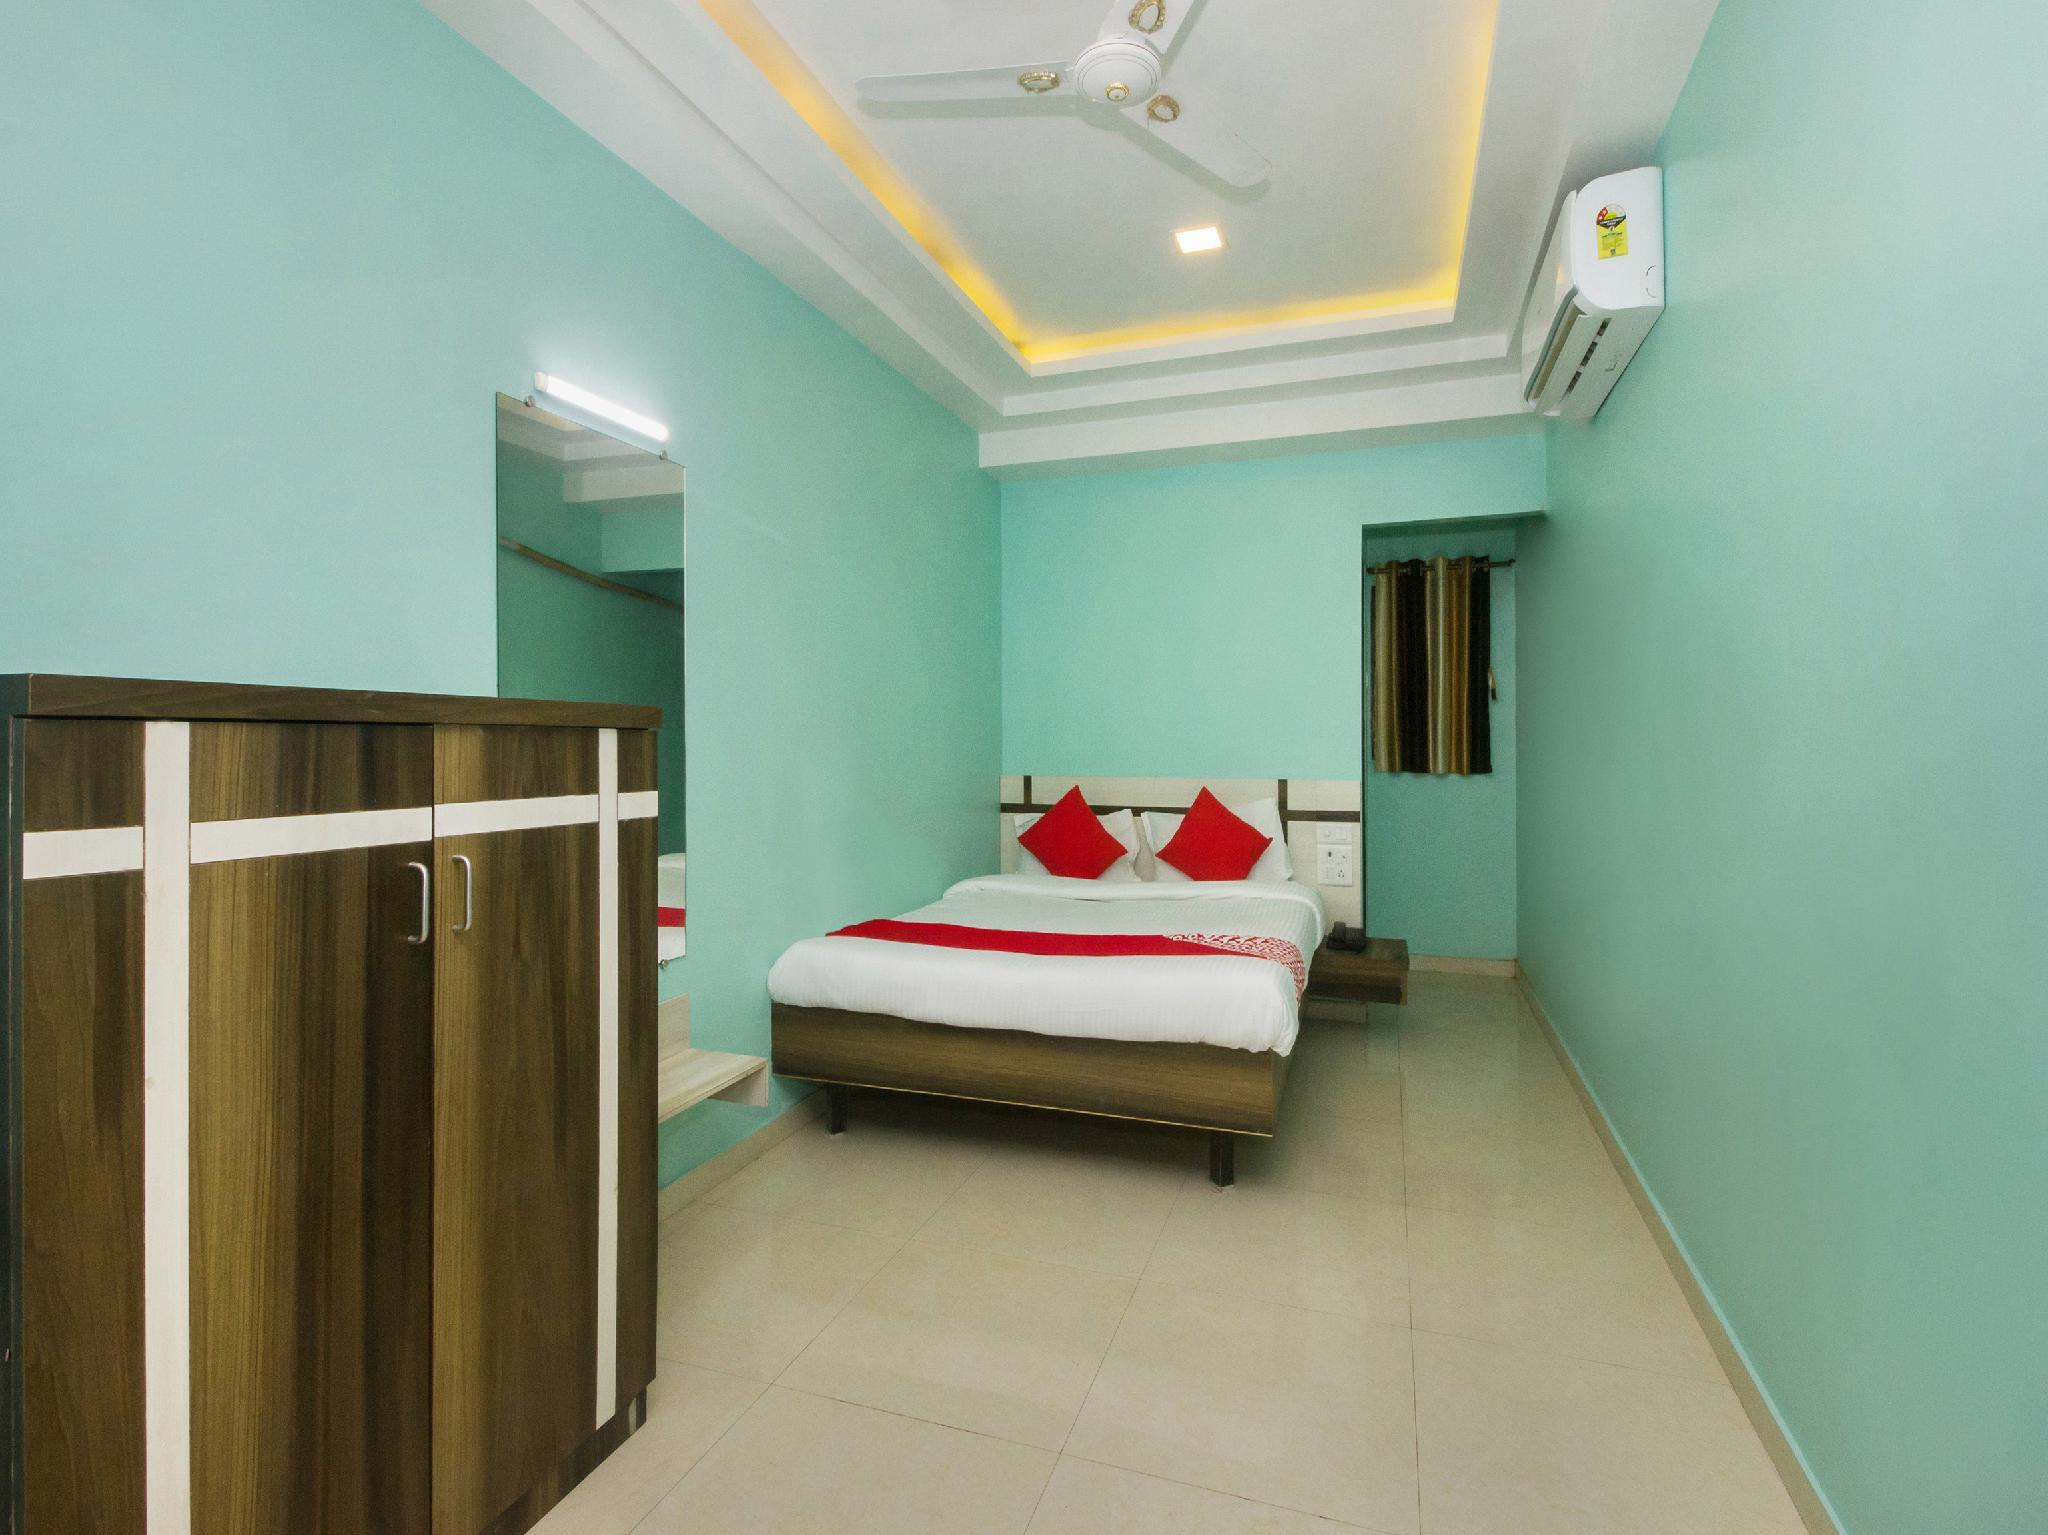 OYO 22918 Hotel Sadanand Mourya Lodging And Boarding, Palghar